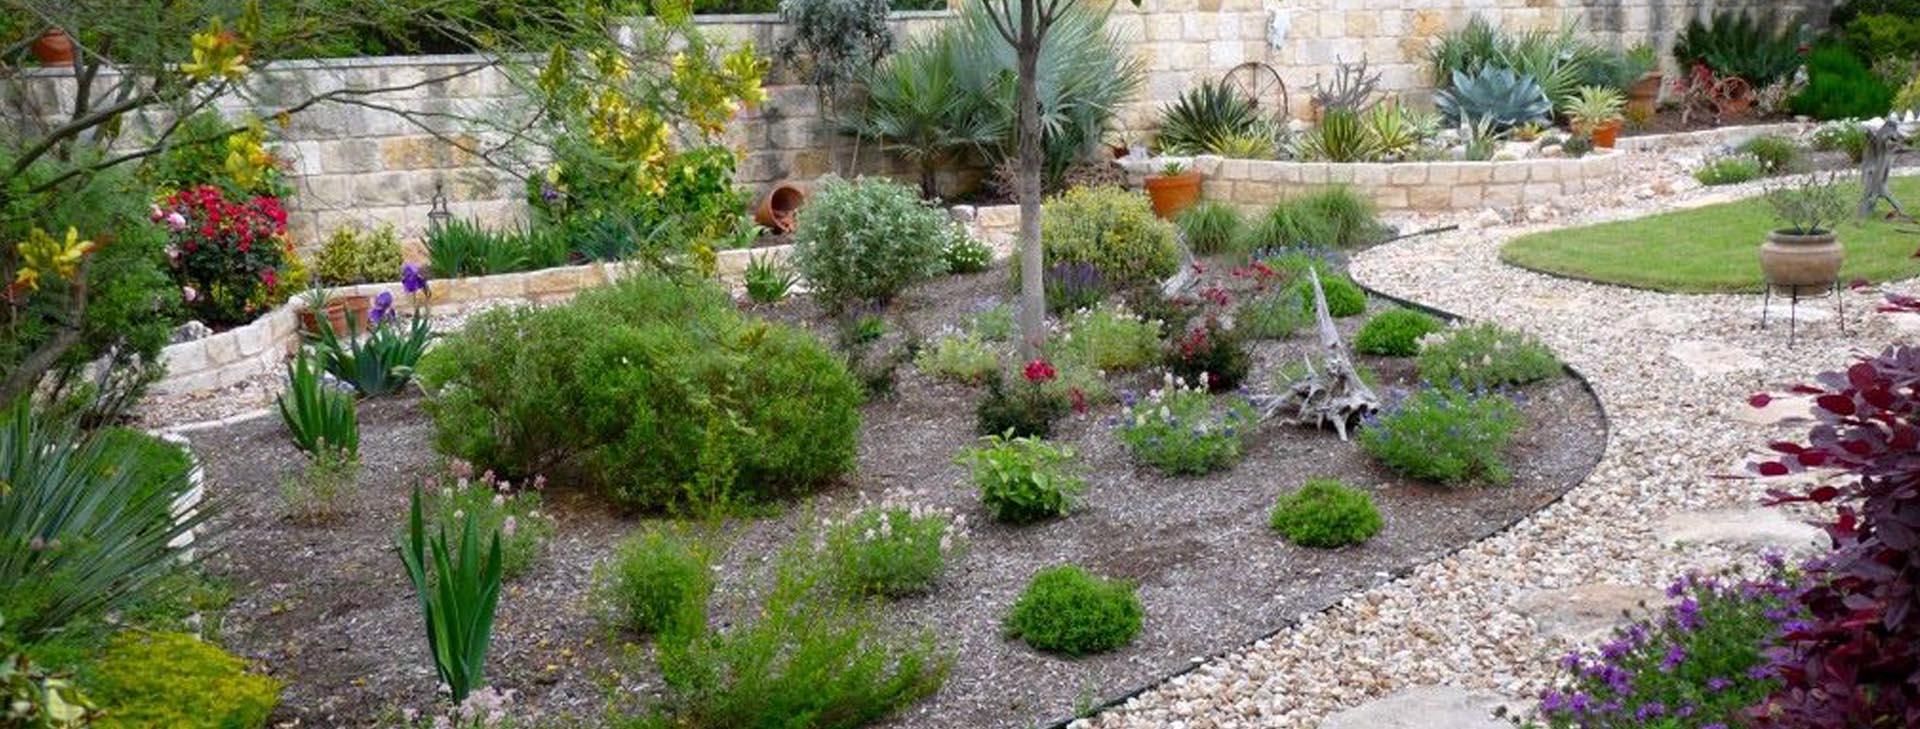 Xeriscape Design and Installation Services - Gardens for Texas